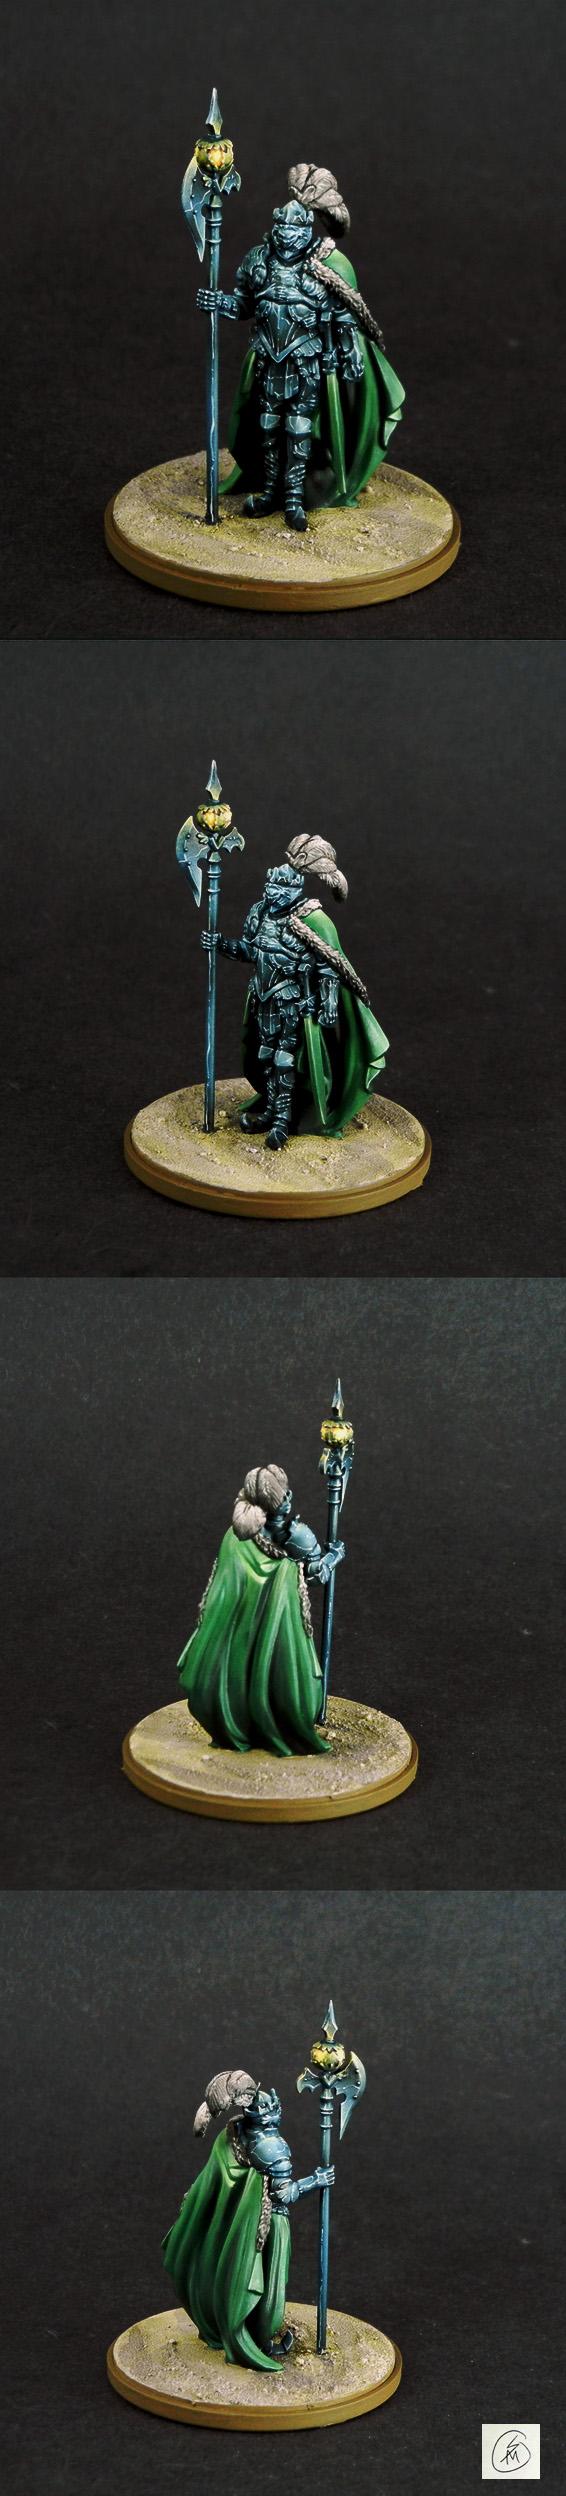 Kingdom Death, The King's Man